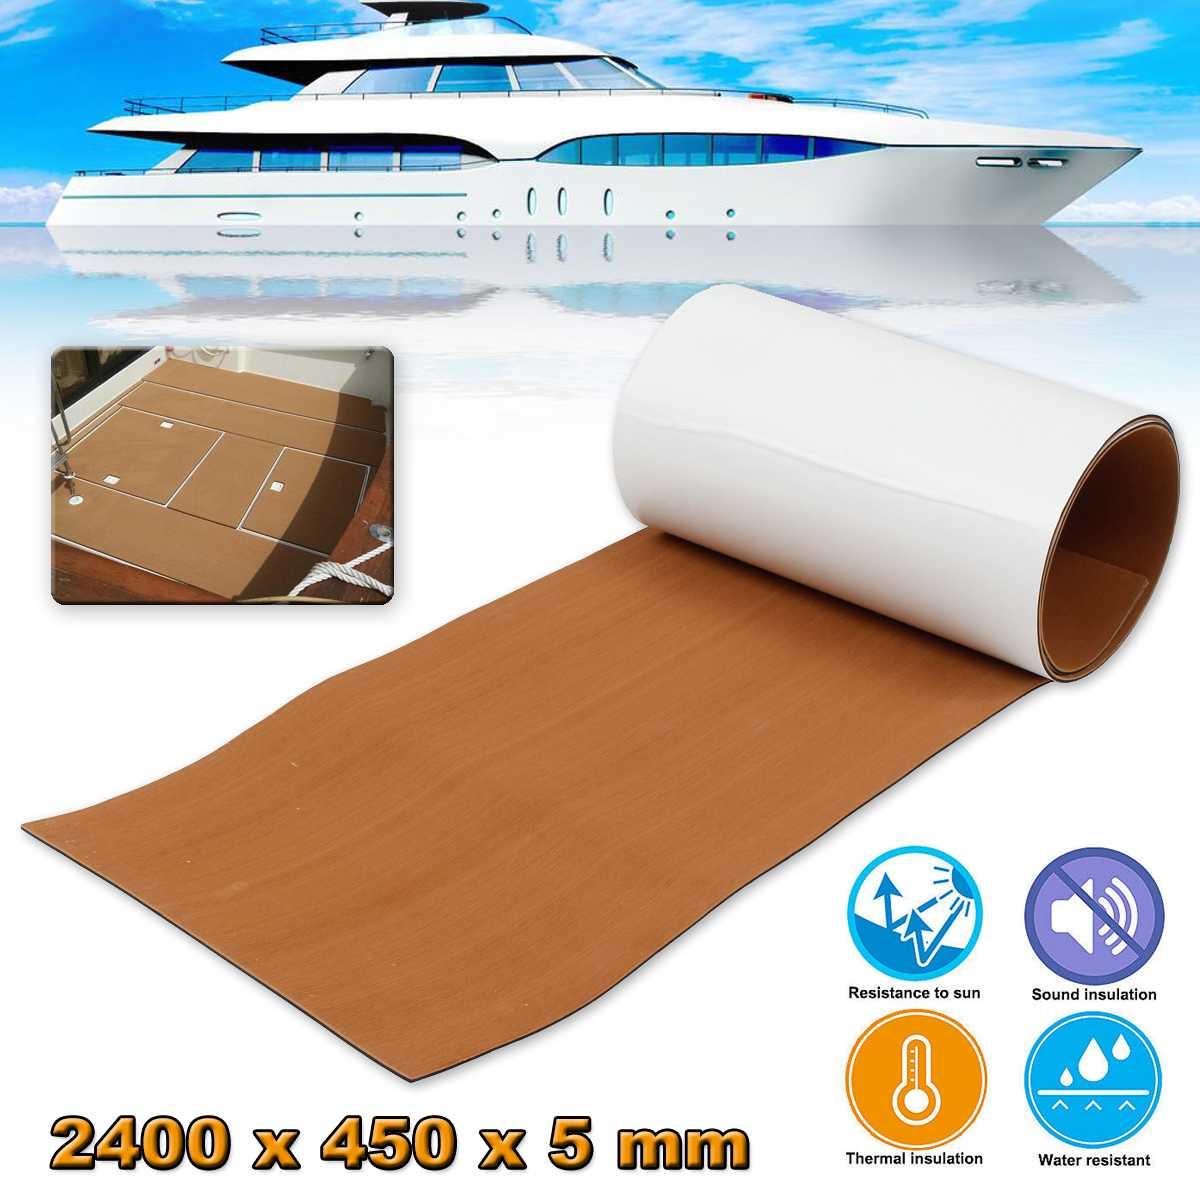 Self-Adhesive EVA Foam Teak Decking Foam Marine Flooring Faux Limo Boat Decking Sheet Accessories Marine 4 Colors 450x2400x5mm